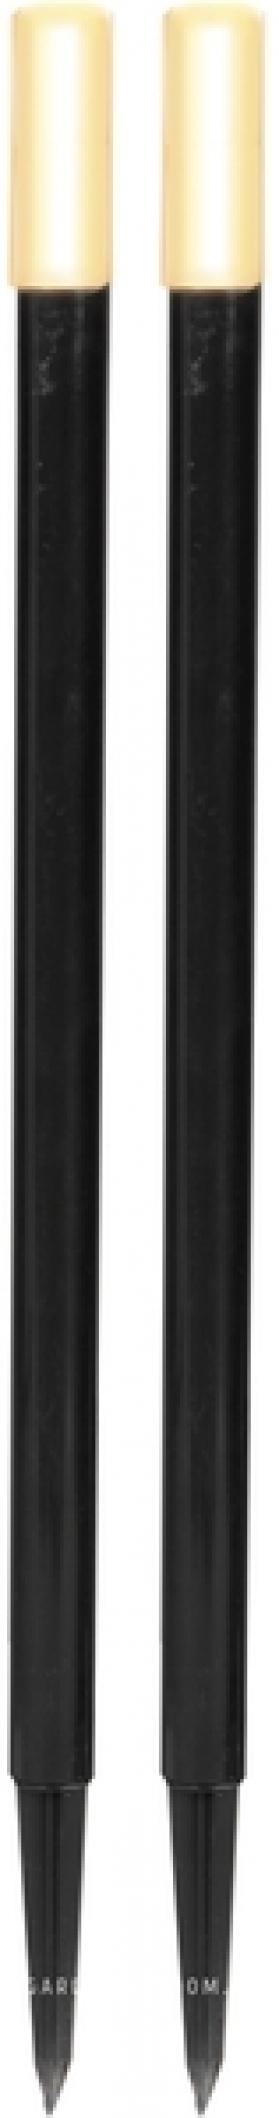 Гирлянда-палочка PATHLIGHT, 54 см, 2 шт, серия SYSTEM 24